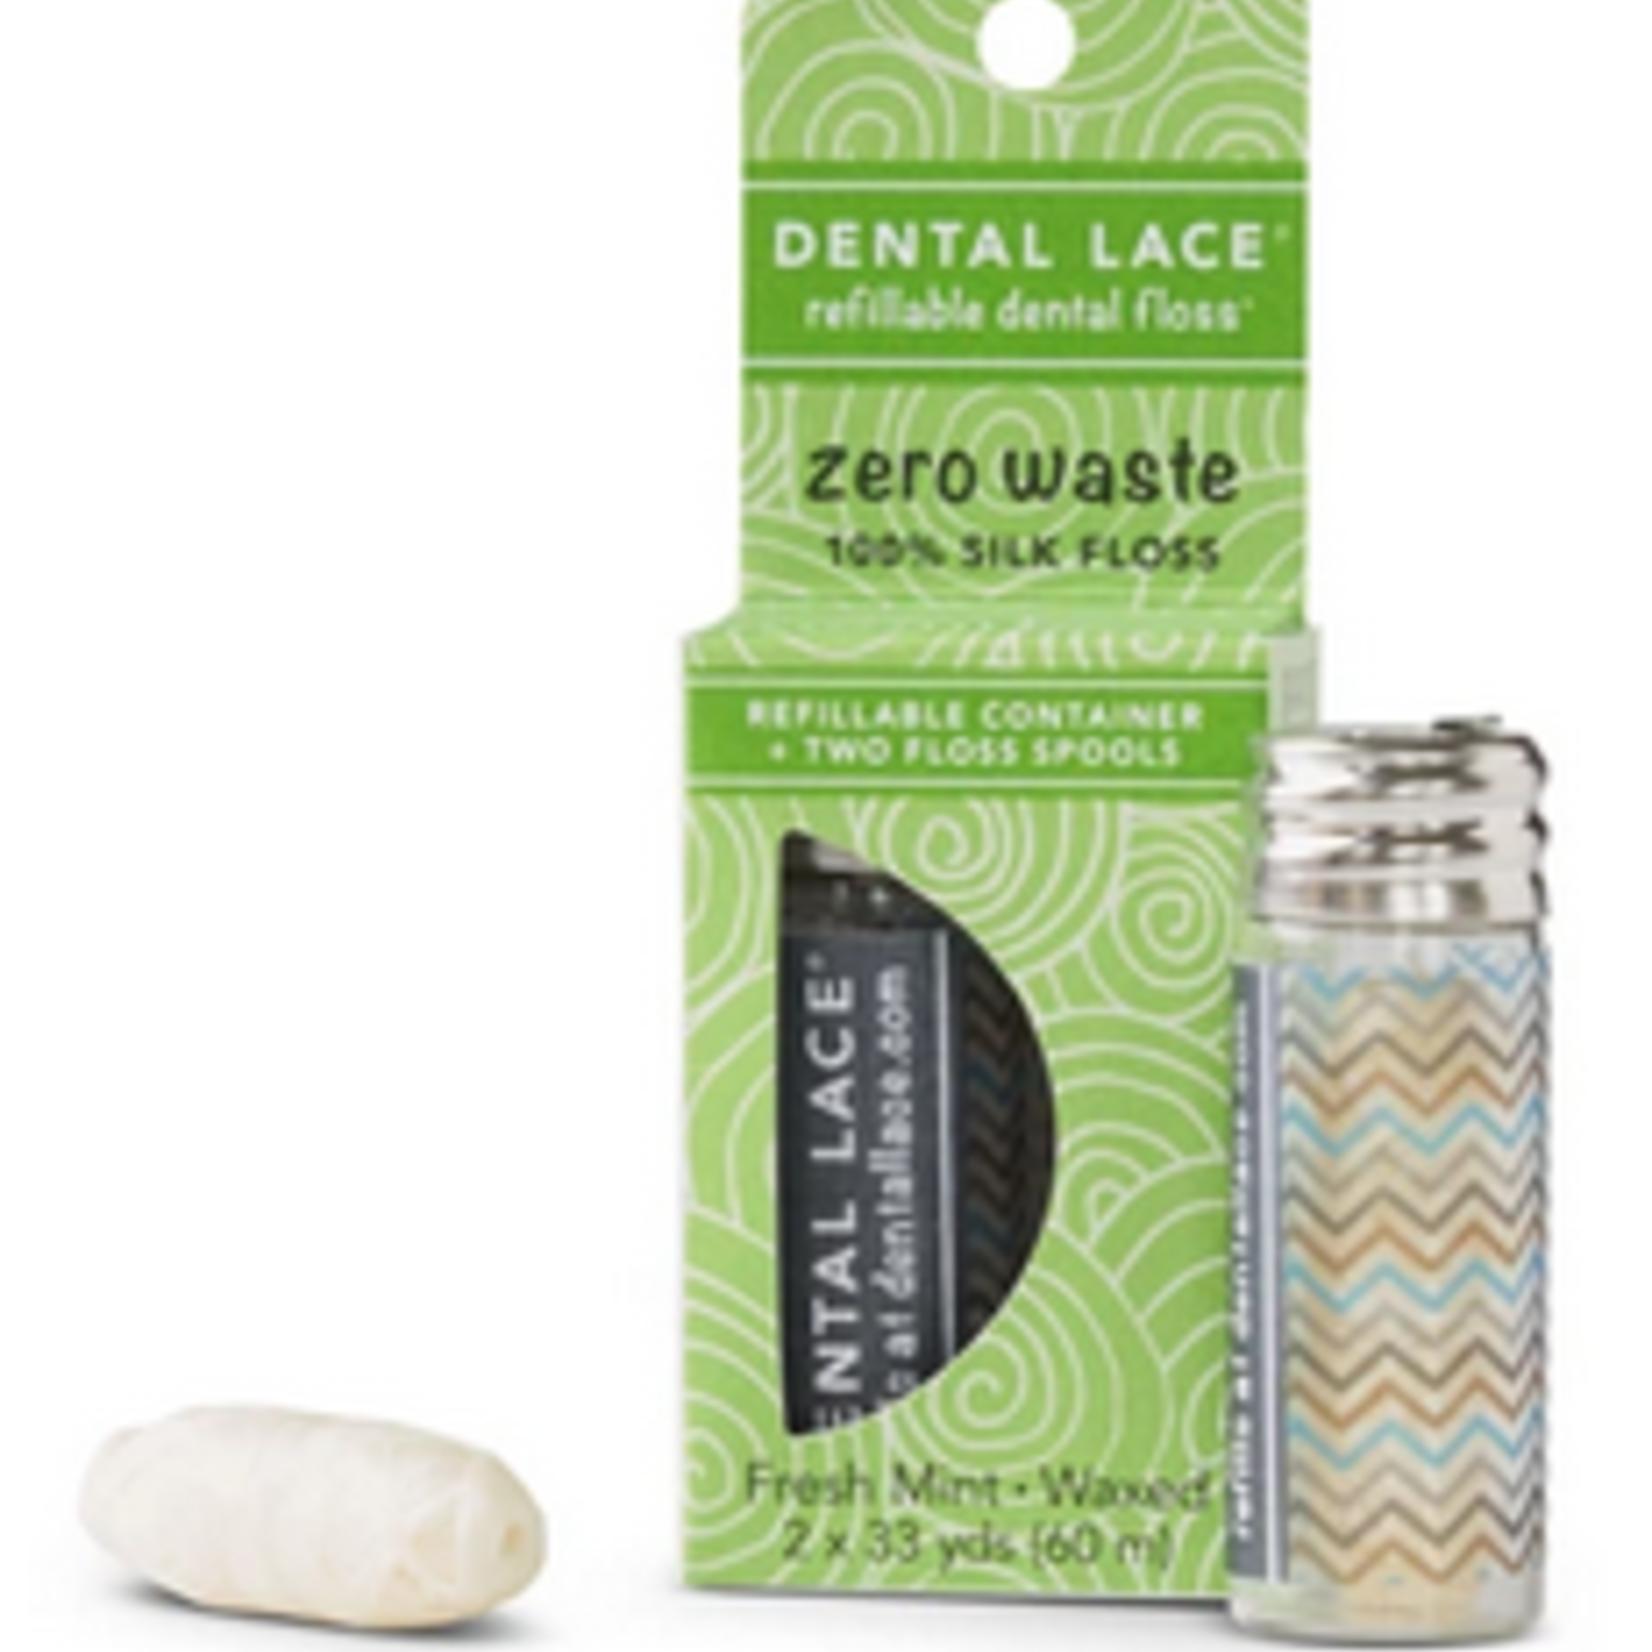 Dental Lace - Silk